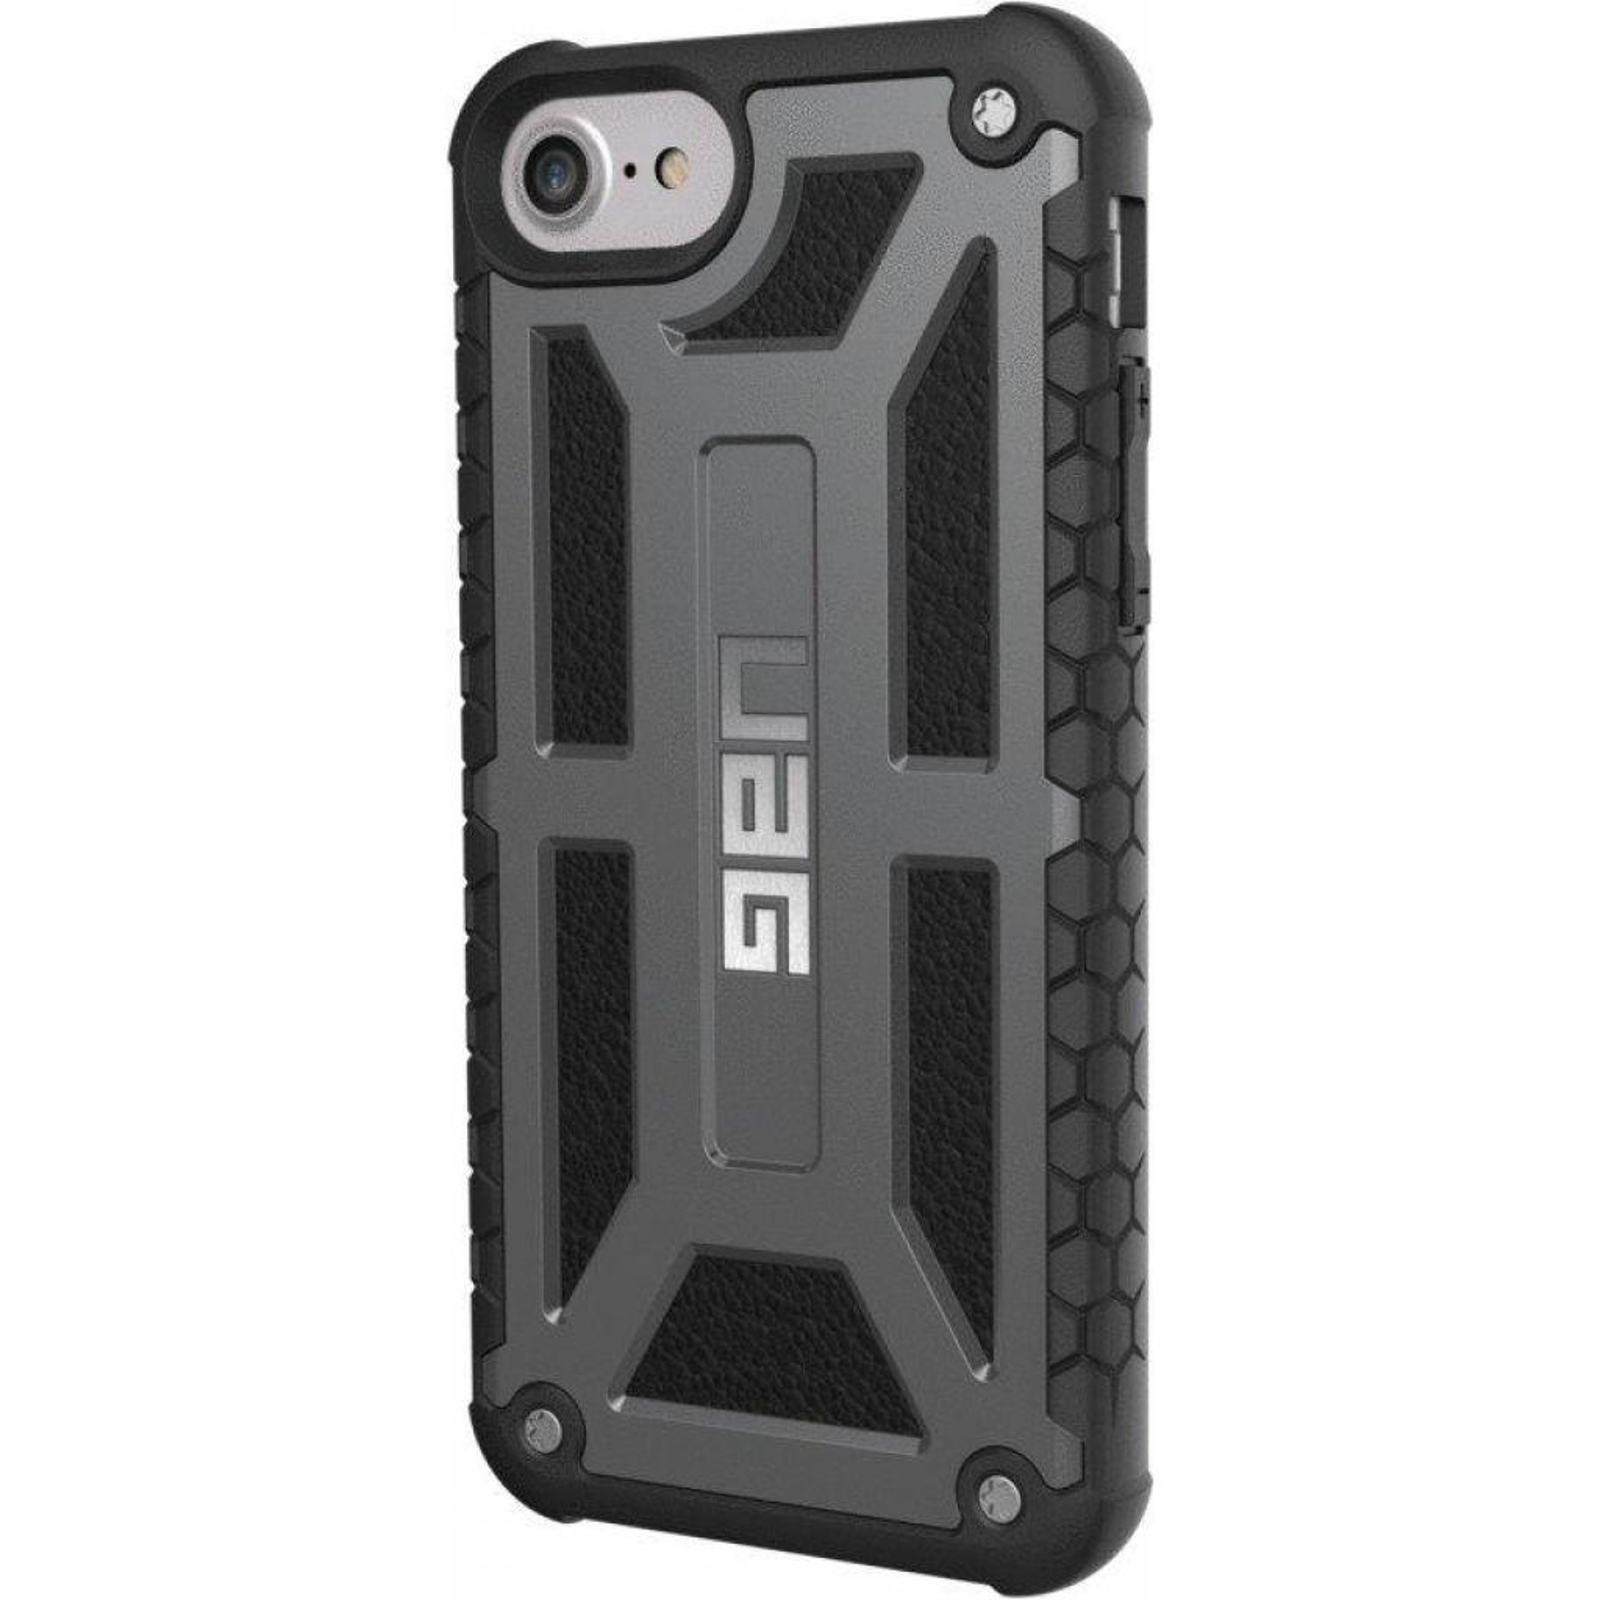 Чехол для моб. телефона Urban Armor Gear iPhone 8/7/6S/6 Monarch Graphite Black (IPH8/7-M-GR) изображение 4